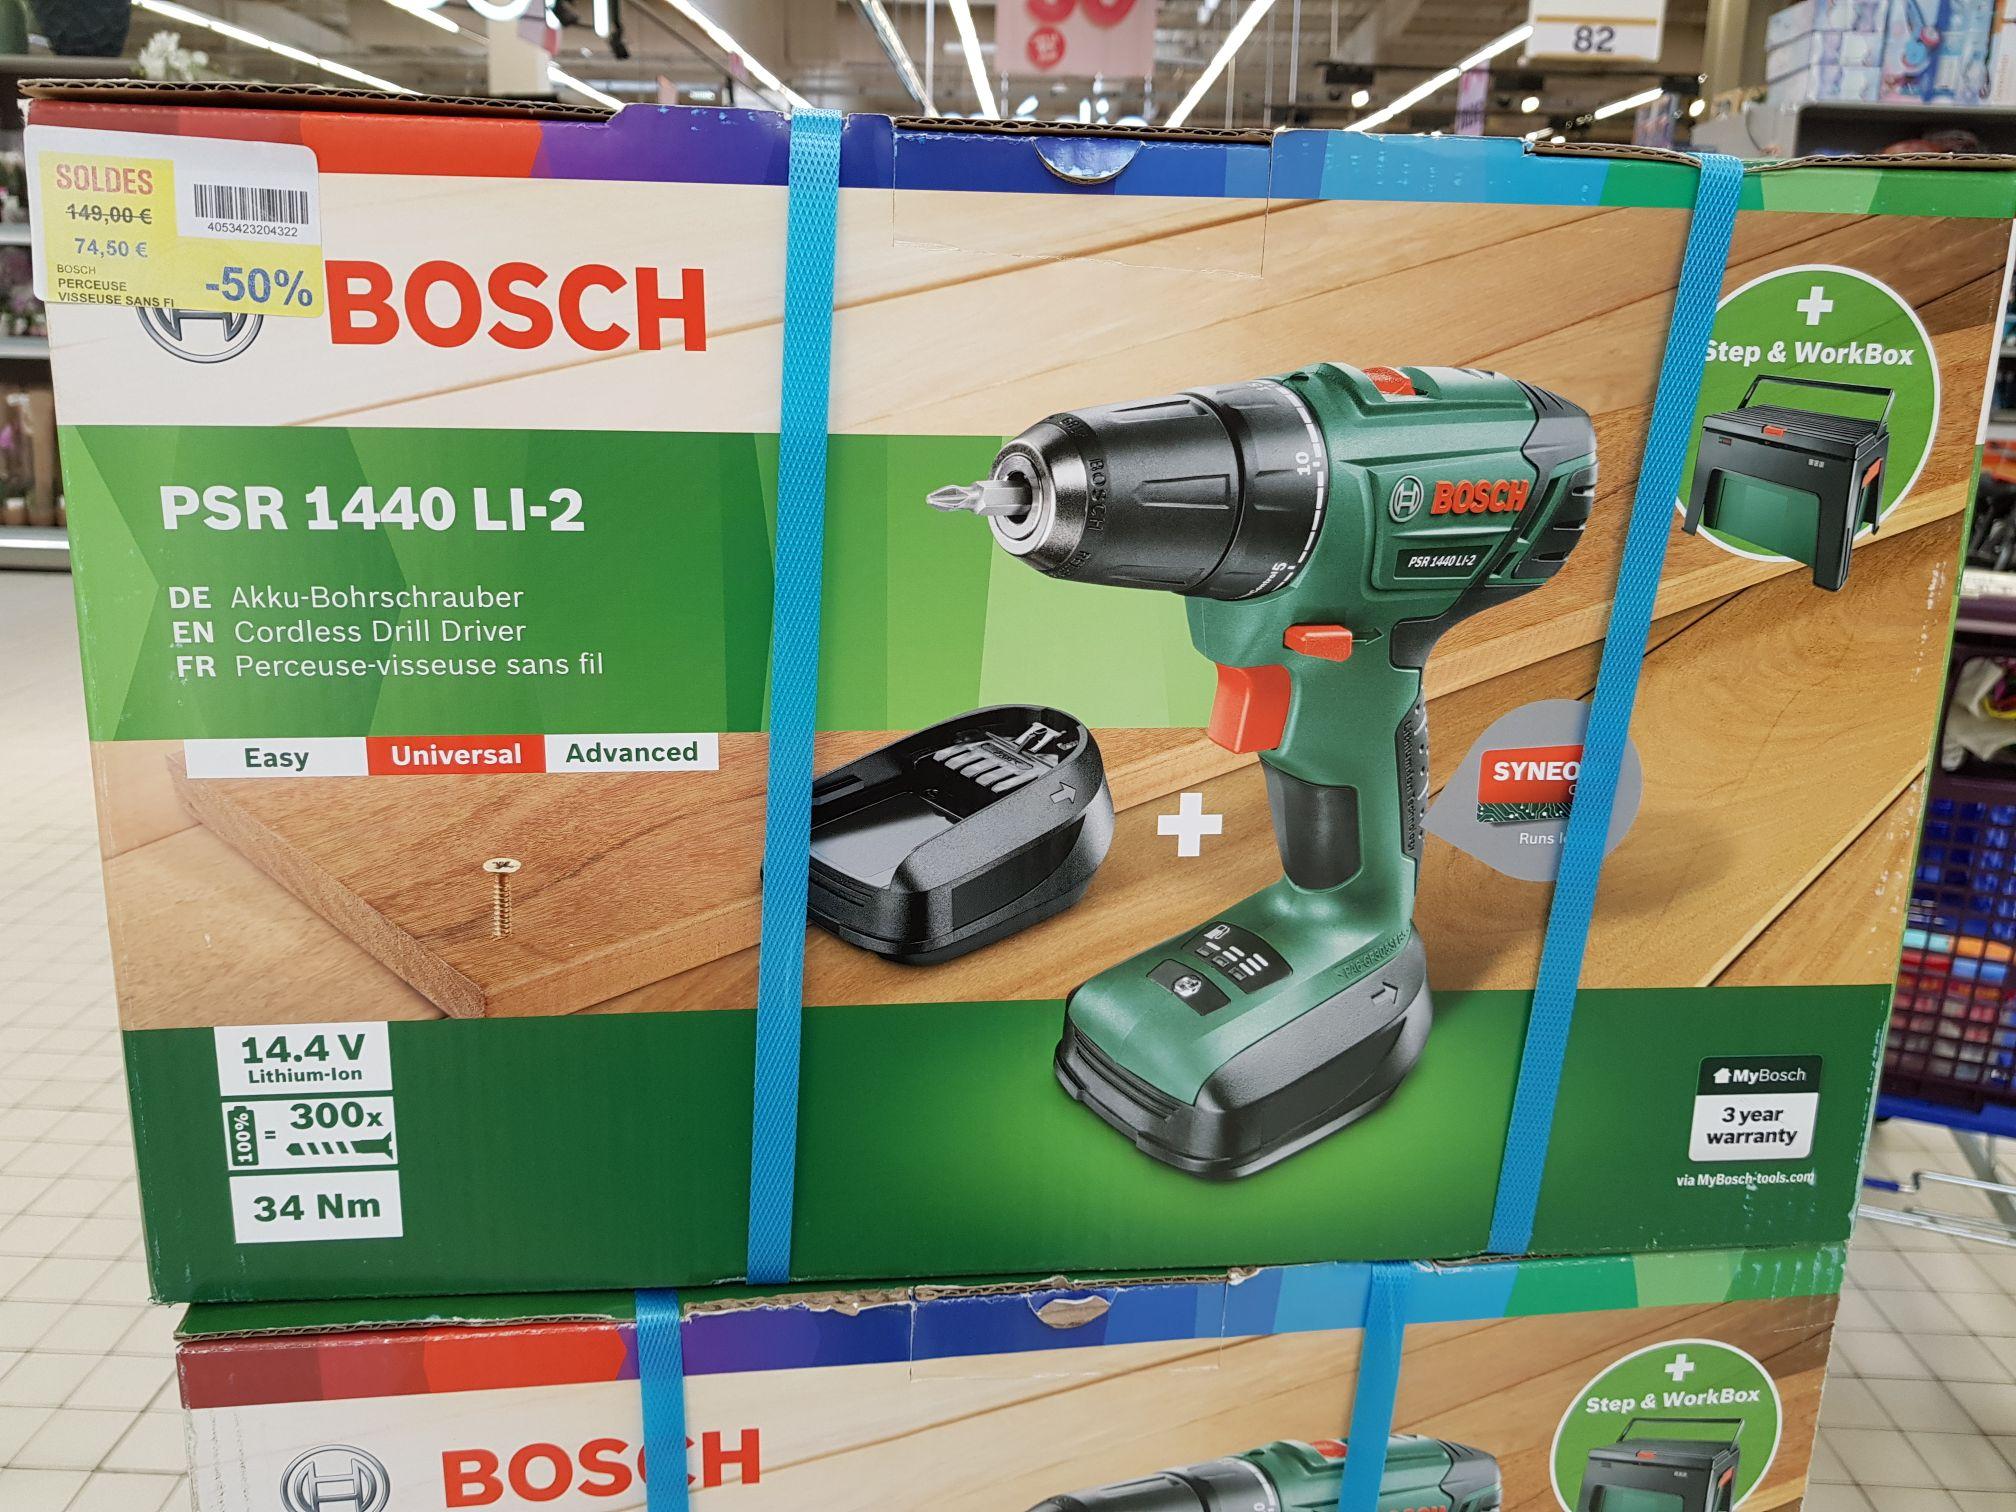 Perceuse-visseuse Sans-fil Bosch PSR1440 LI (14.4V, 2 batteries Lithium-Ion) - Labege (31)